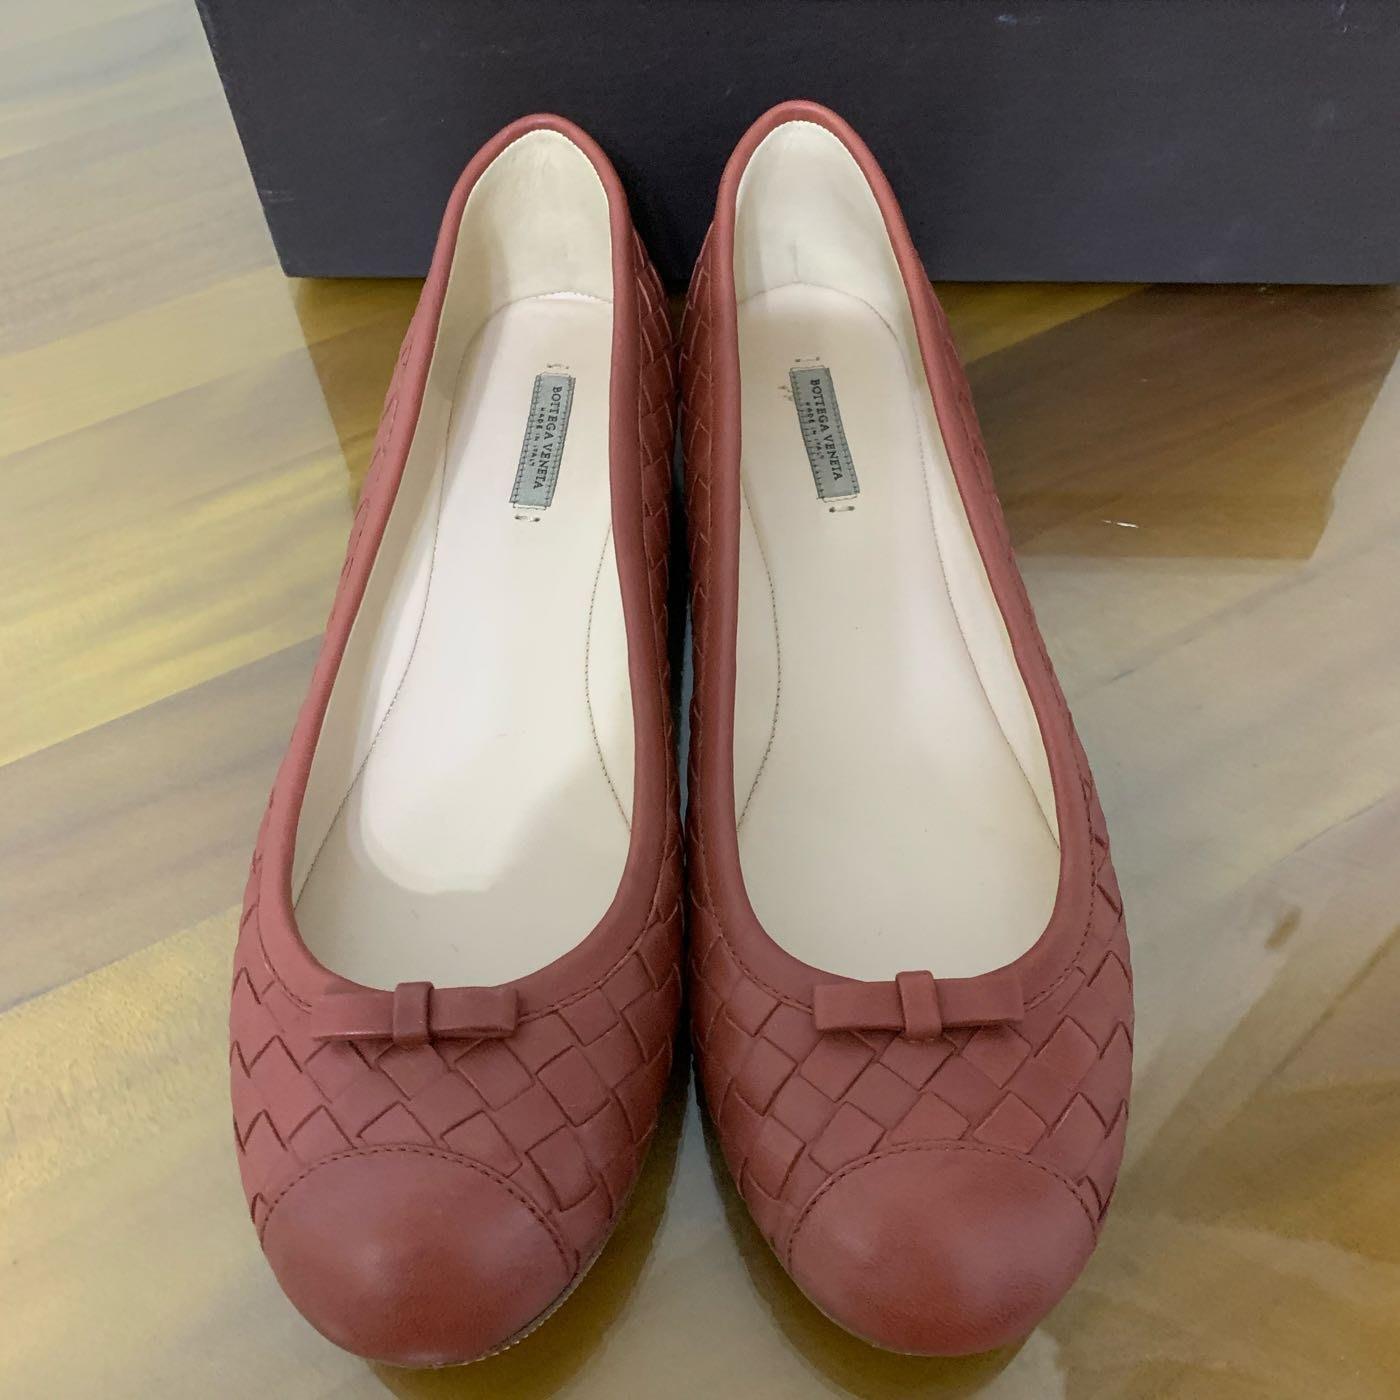 Bottega veneta 磚紅色編織娃娃鞋 真品 美鞋ㄧ雙